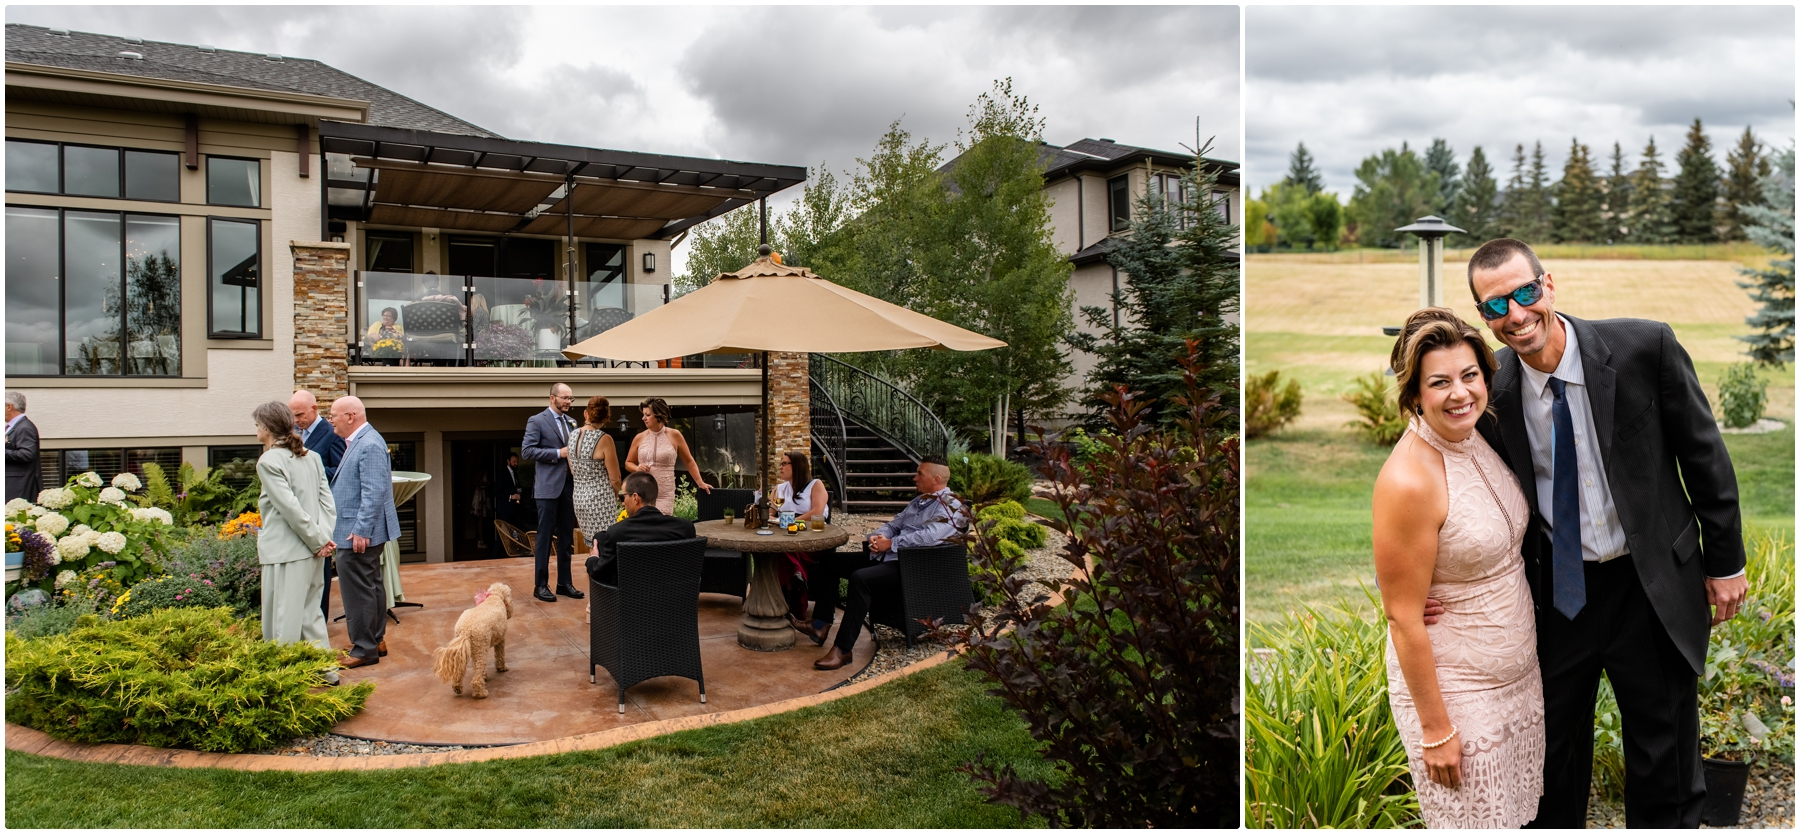 Calgary Wedding Photographers - Garden Party Wedding